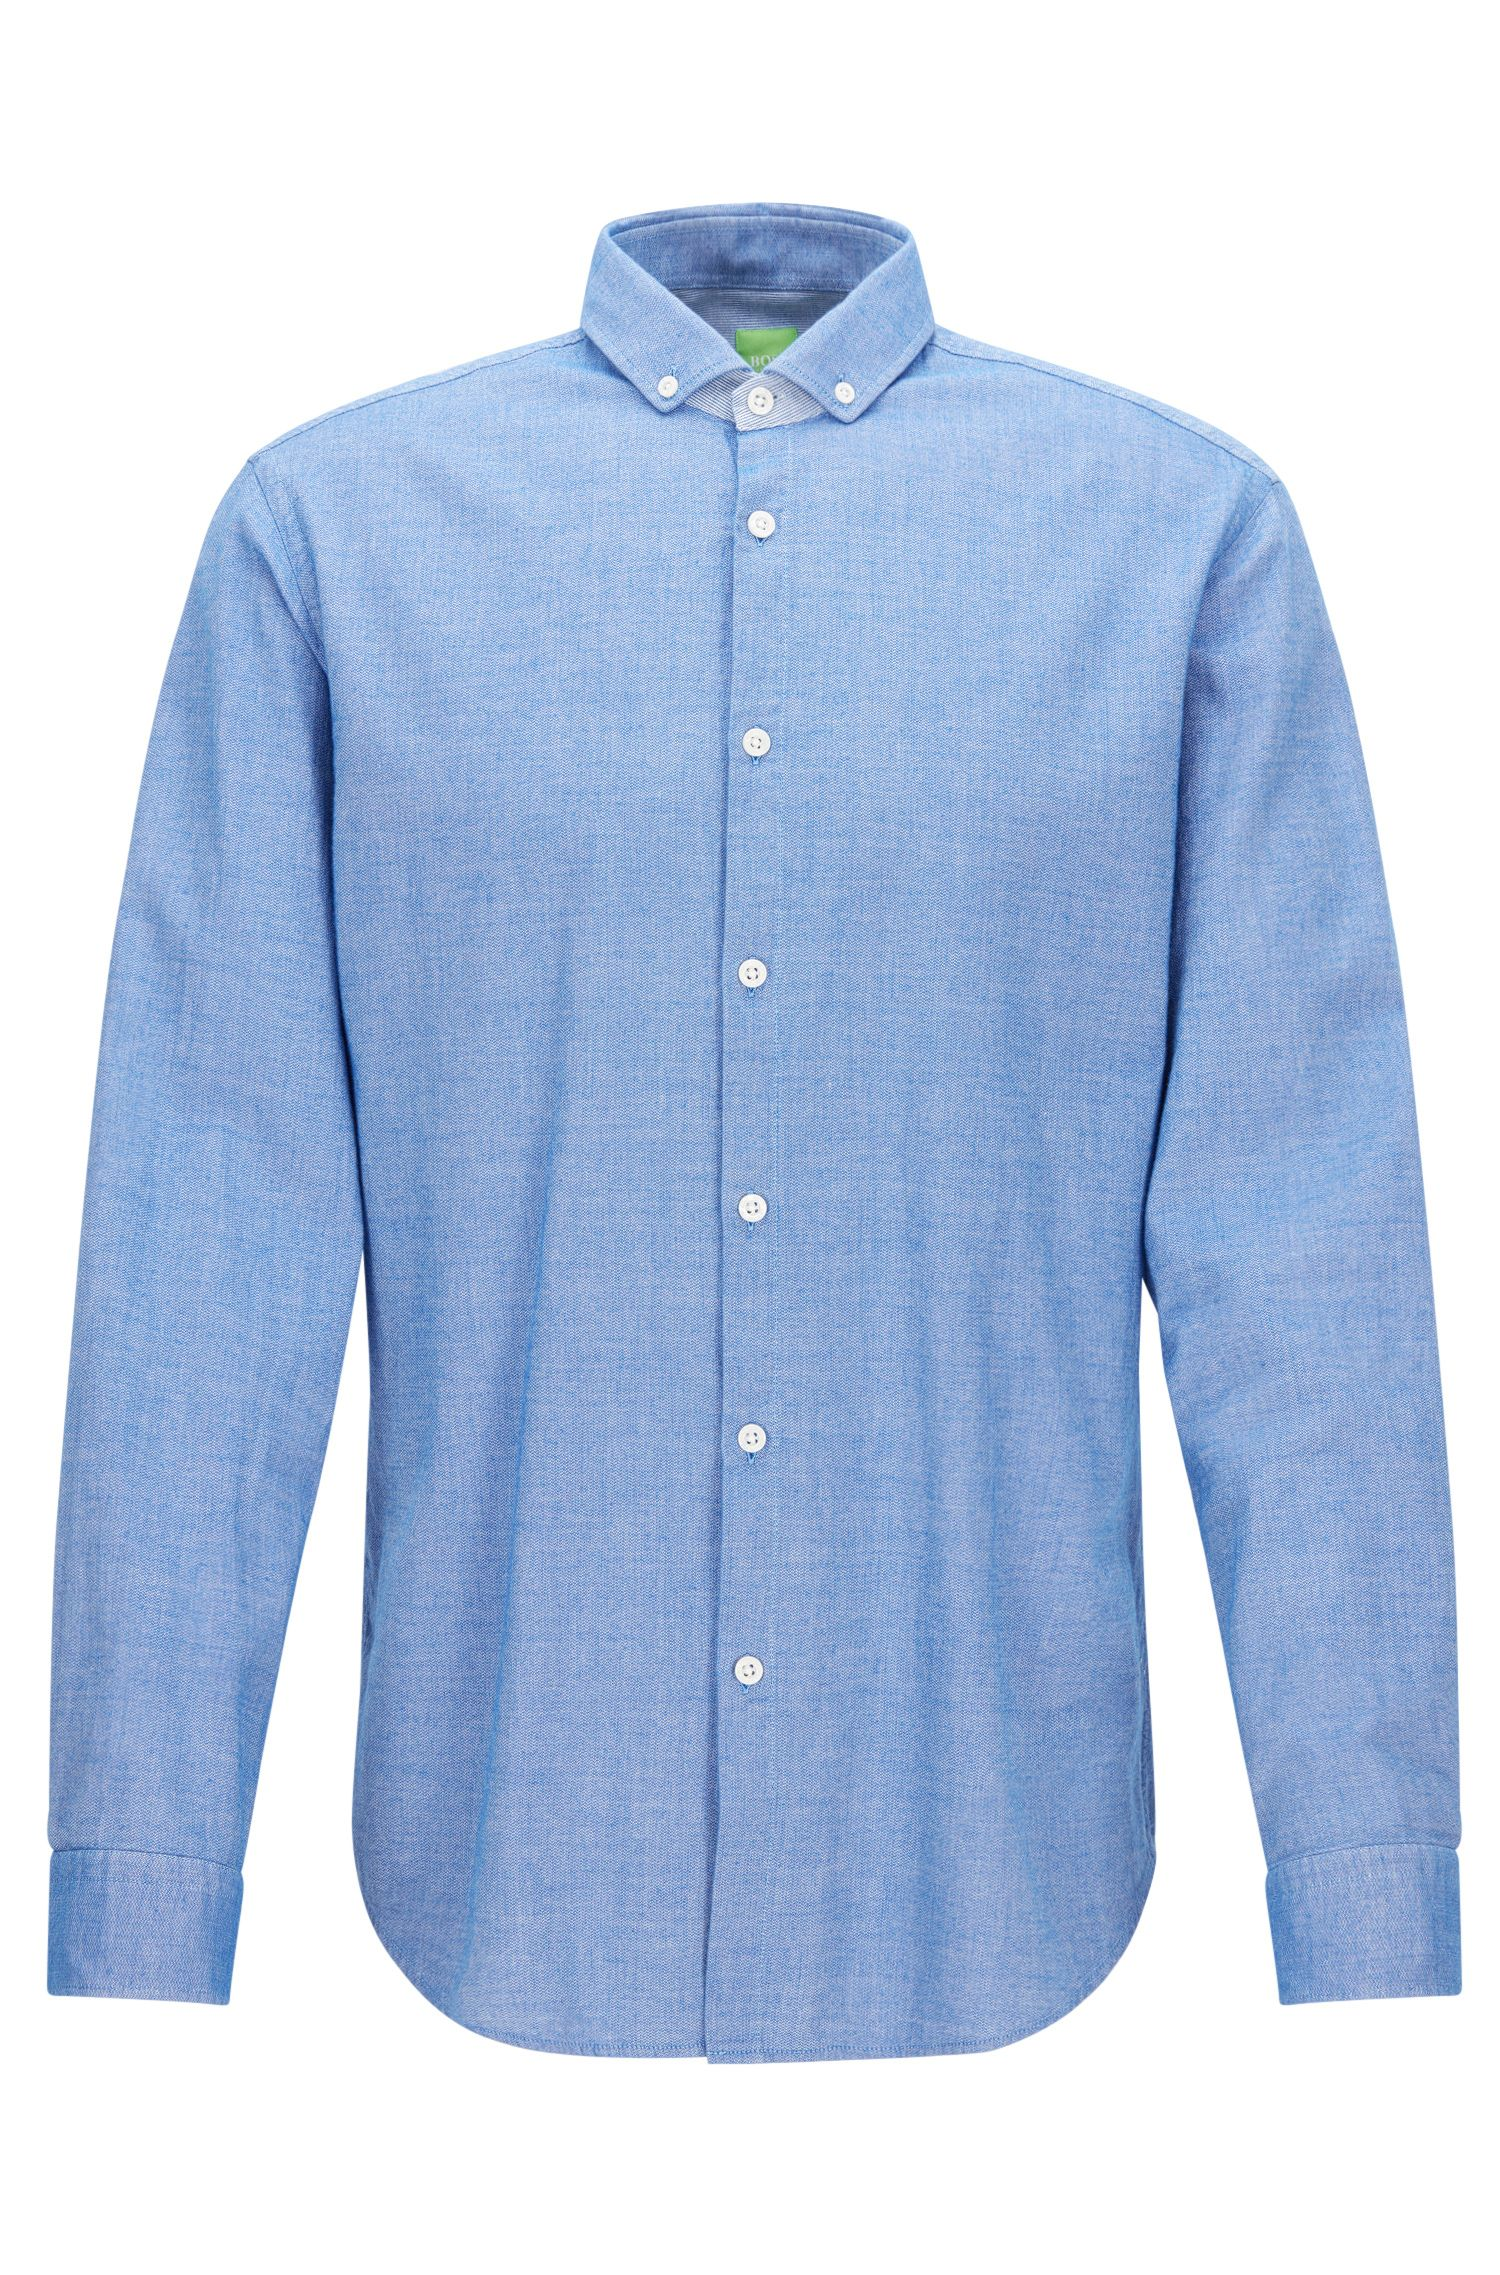 Regular-Fit-Hemd aus Baumwolle in Denim-Optik